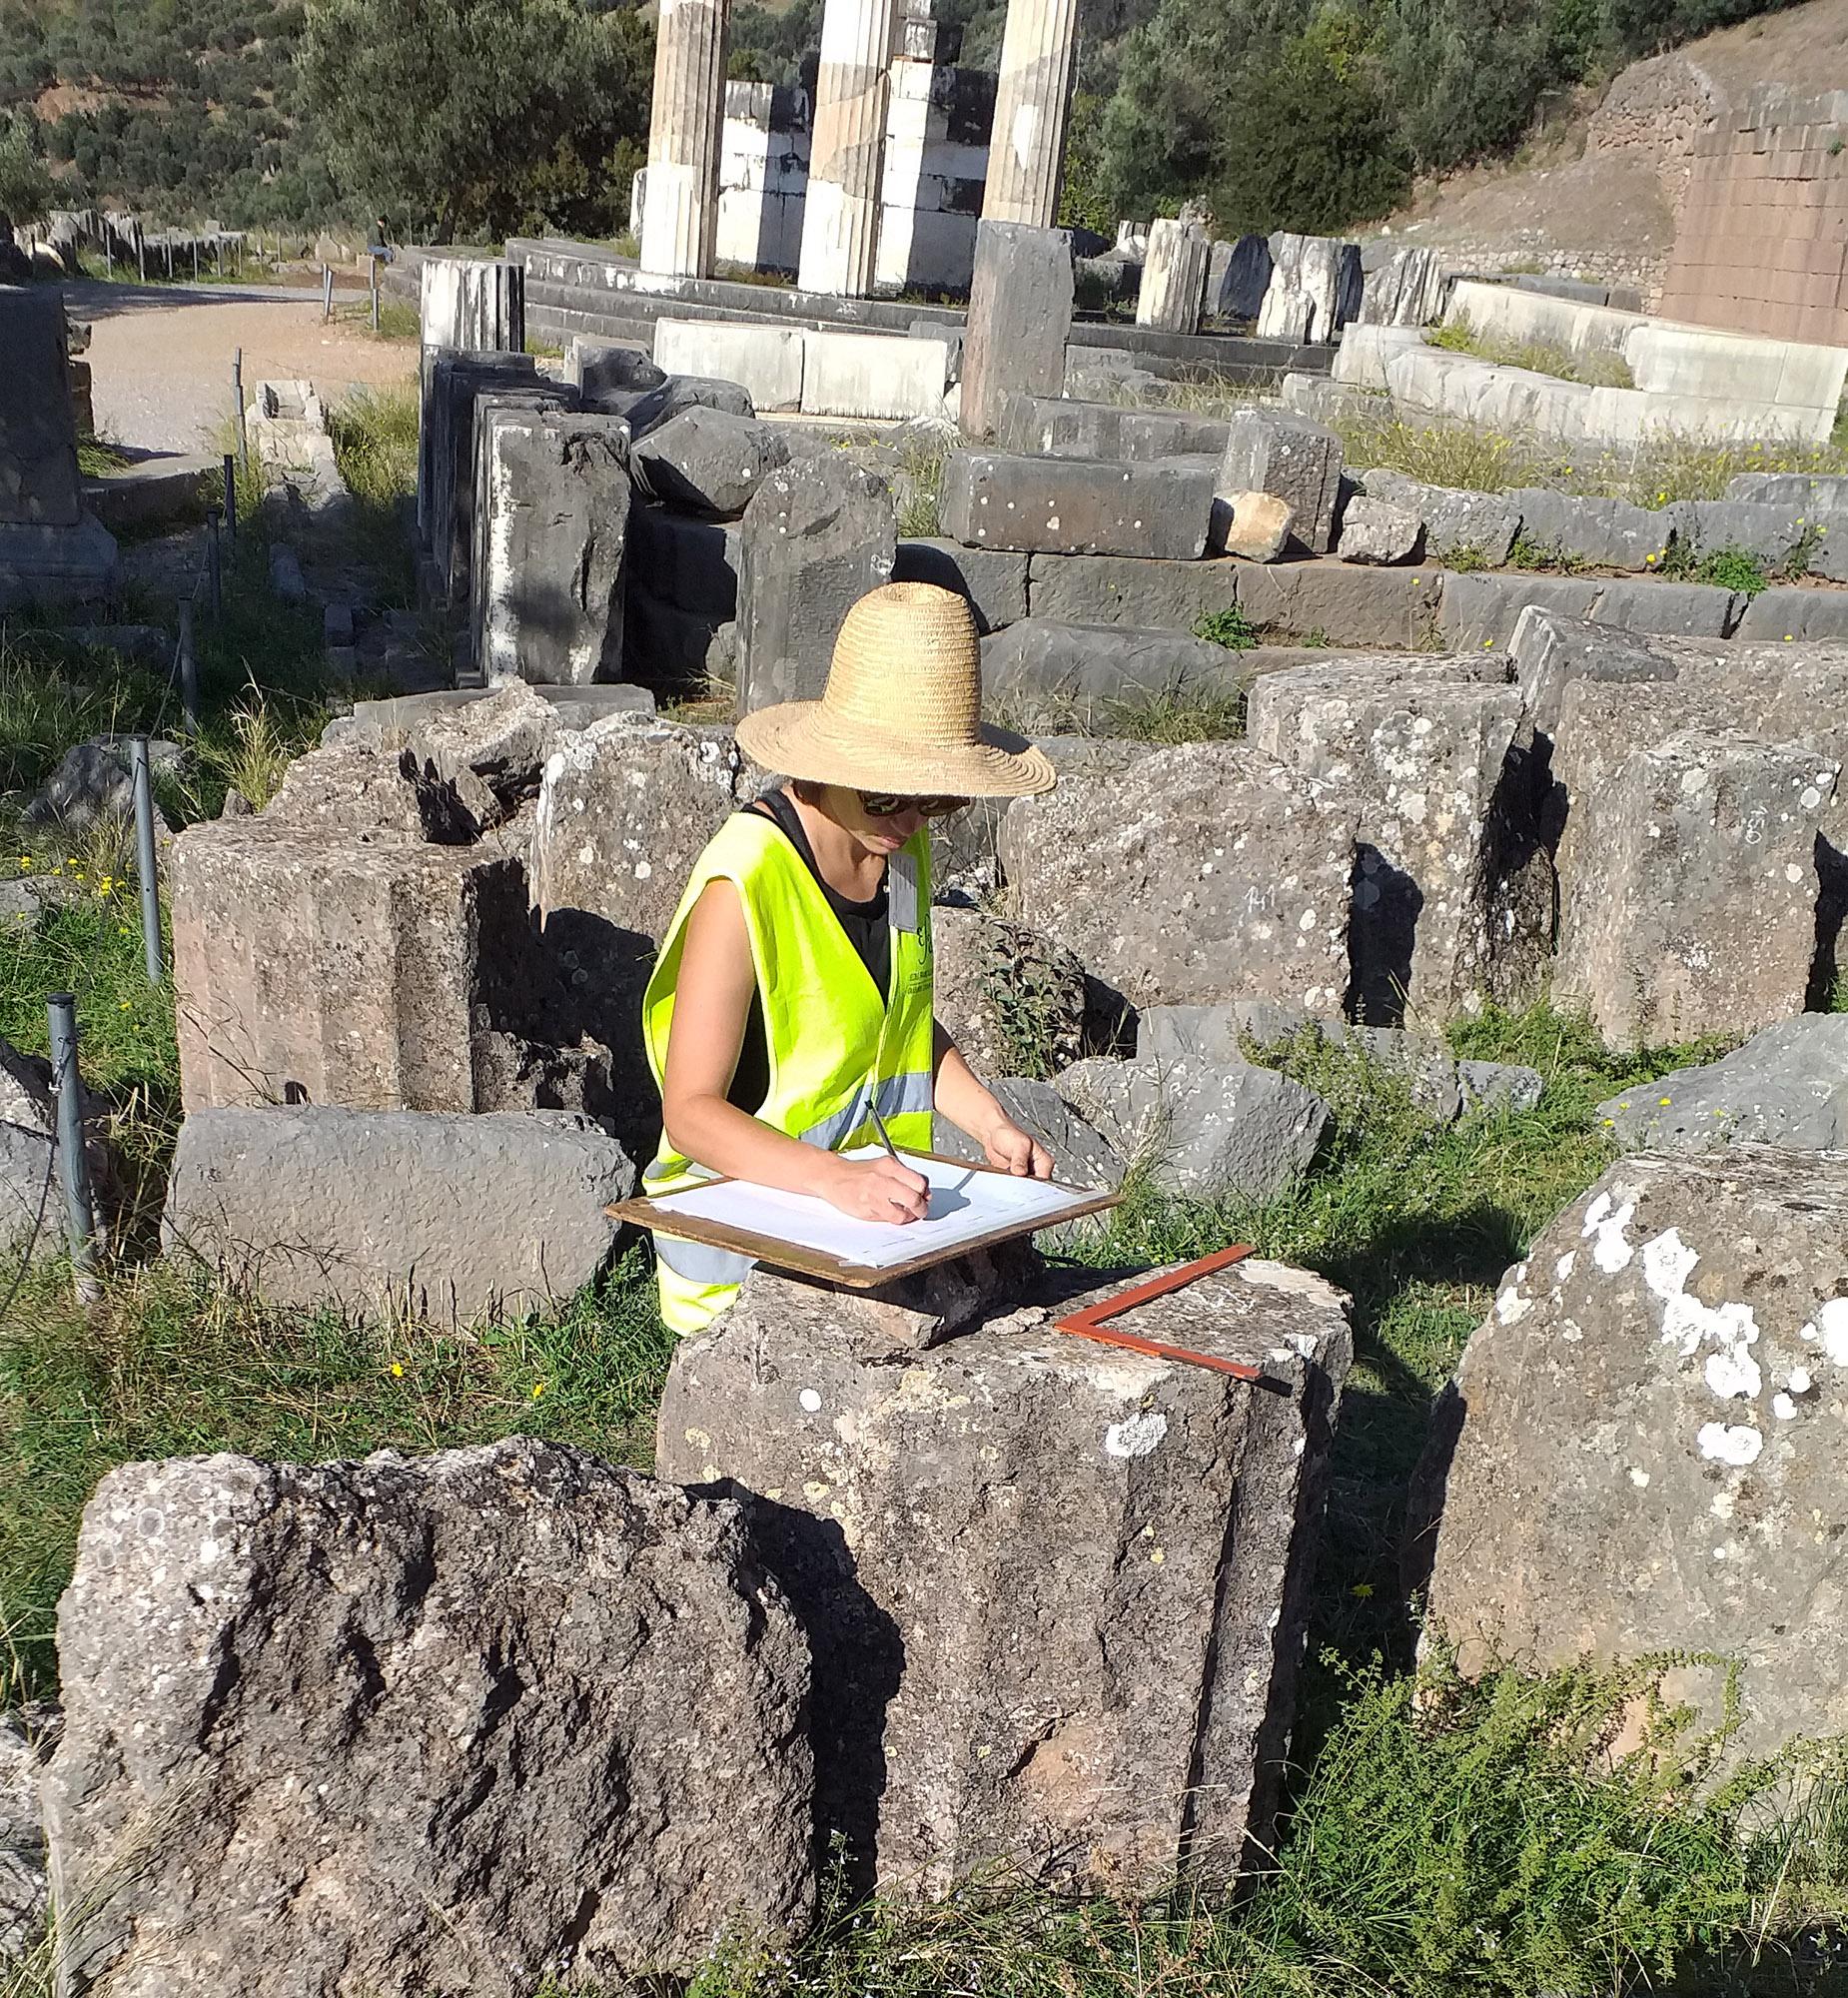 Inventaire des blocs sur la terrasse de Marmaria, 2020 © EFA/Mission Delphes-Marmaria